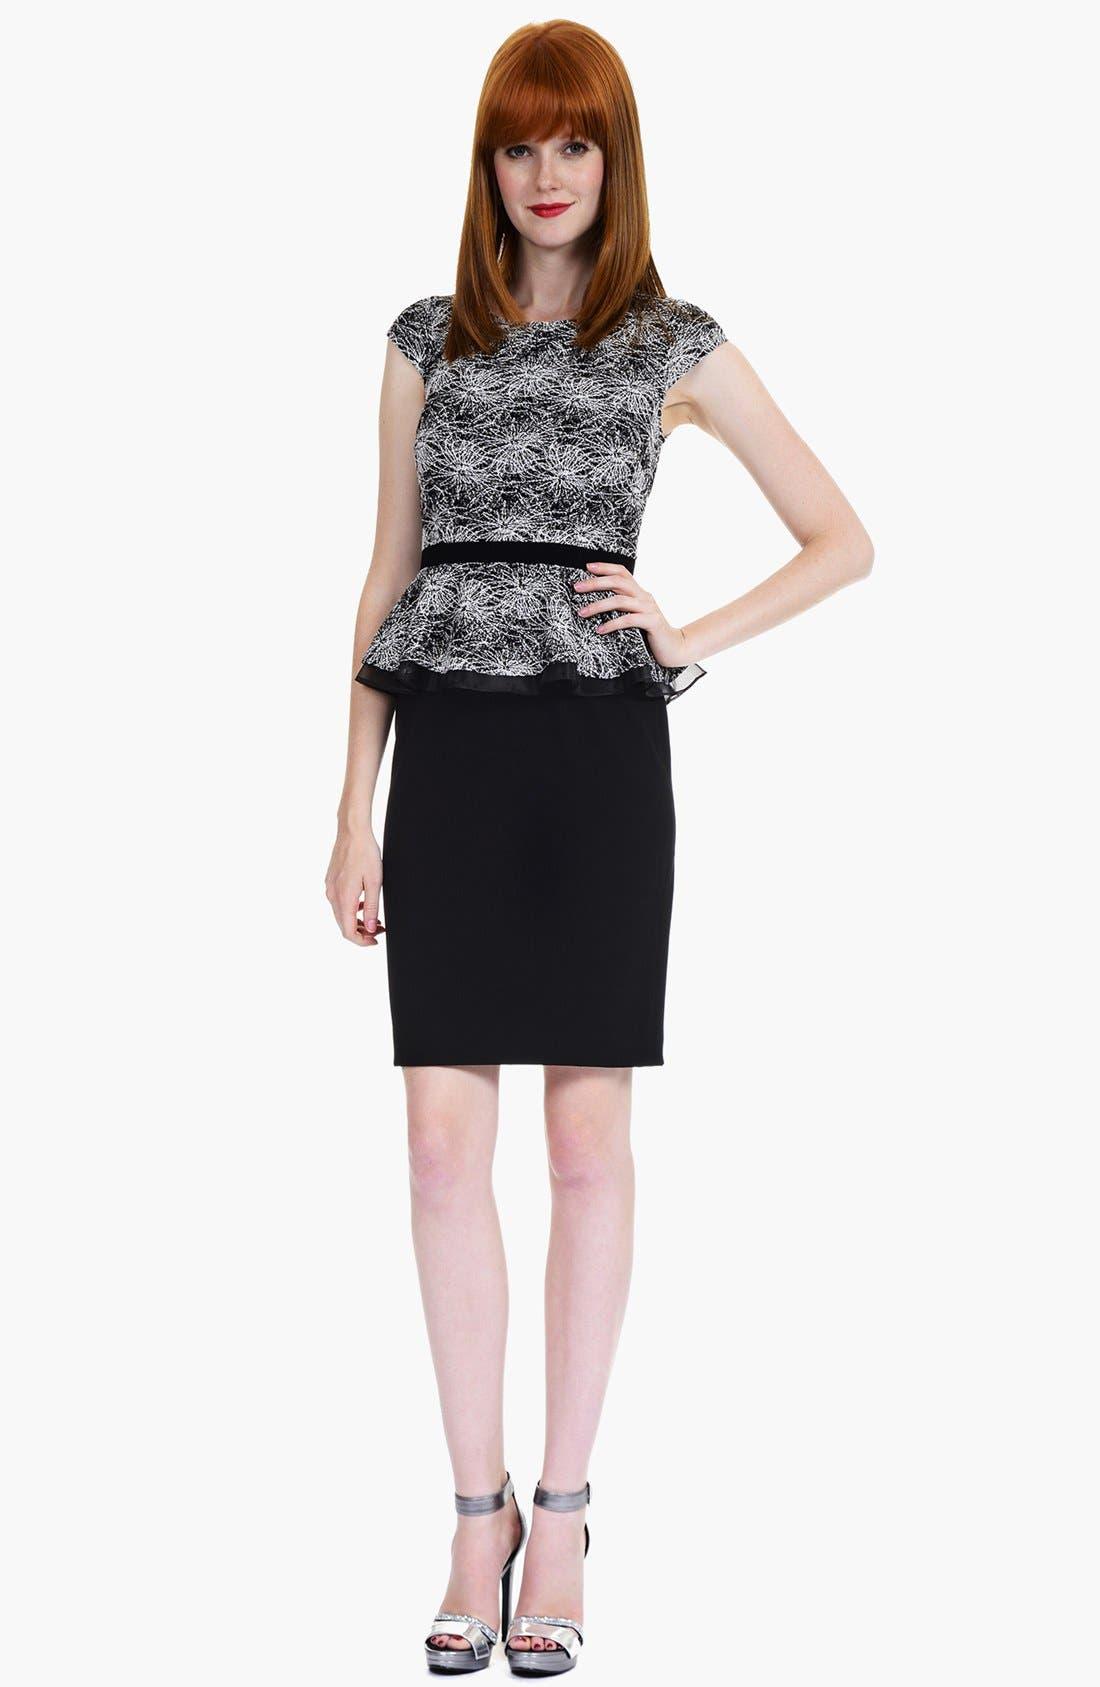 Alternate Image 1 Selected - Kay Unger Print Lace Peplum Sheath Dress